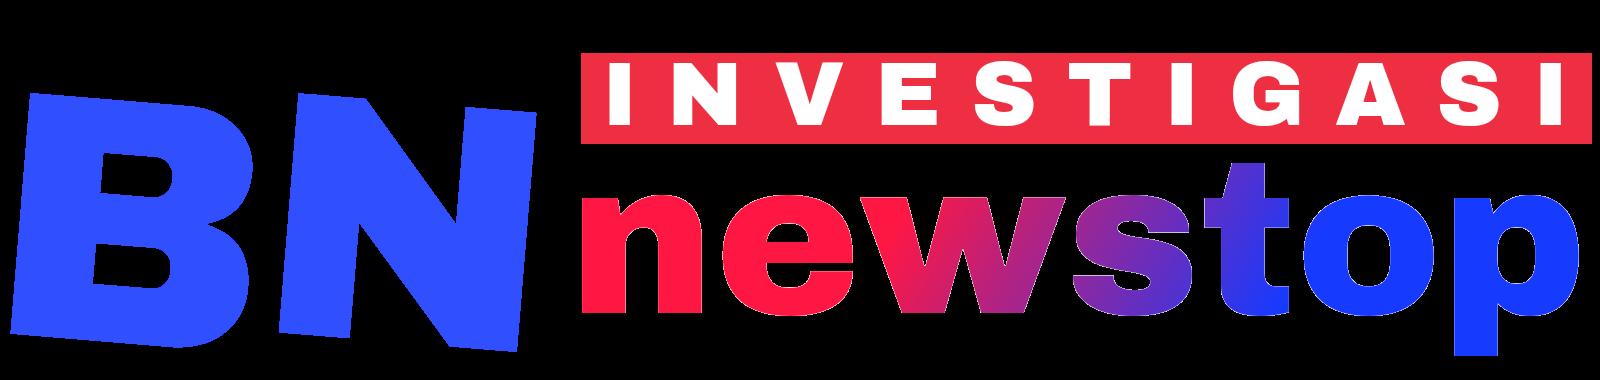 BNnews INVESTIGASI